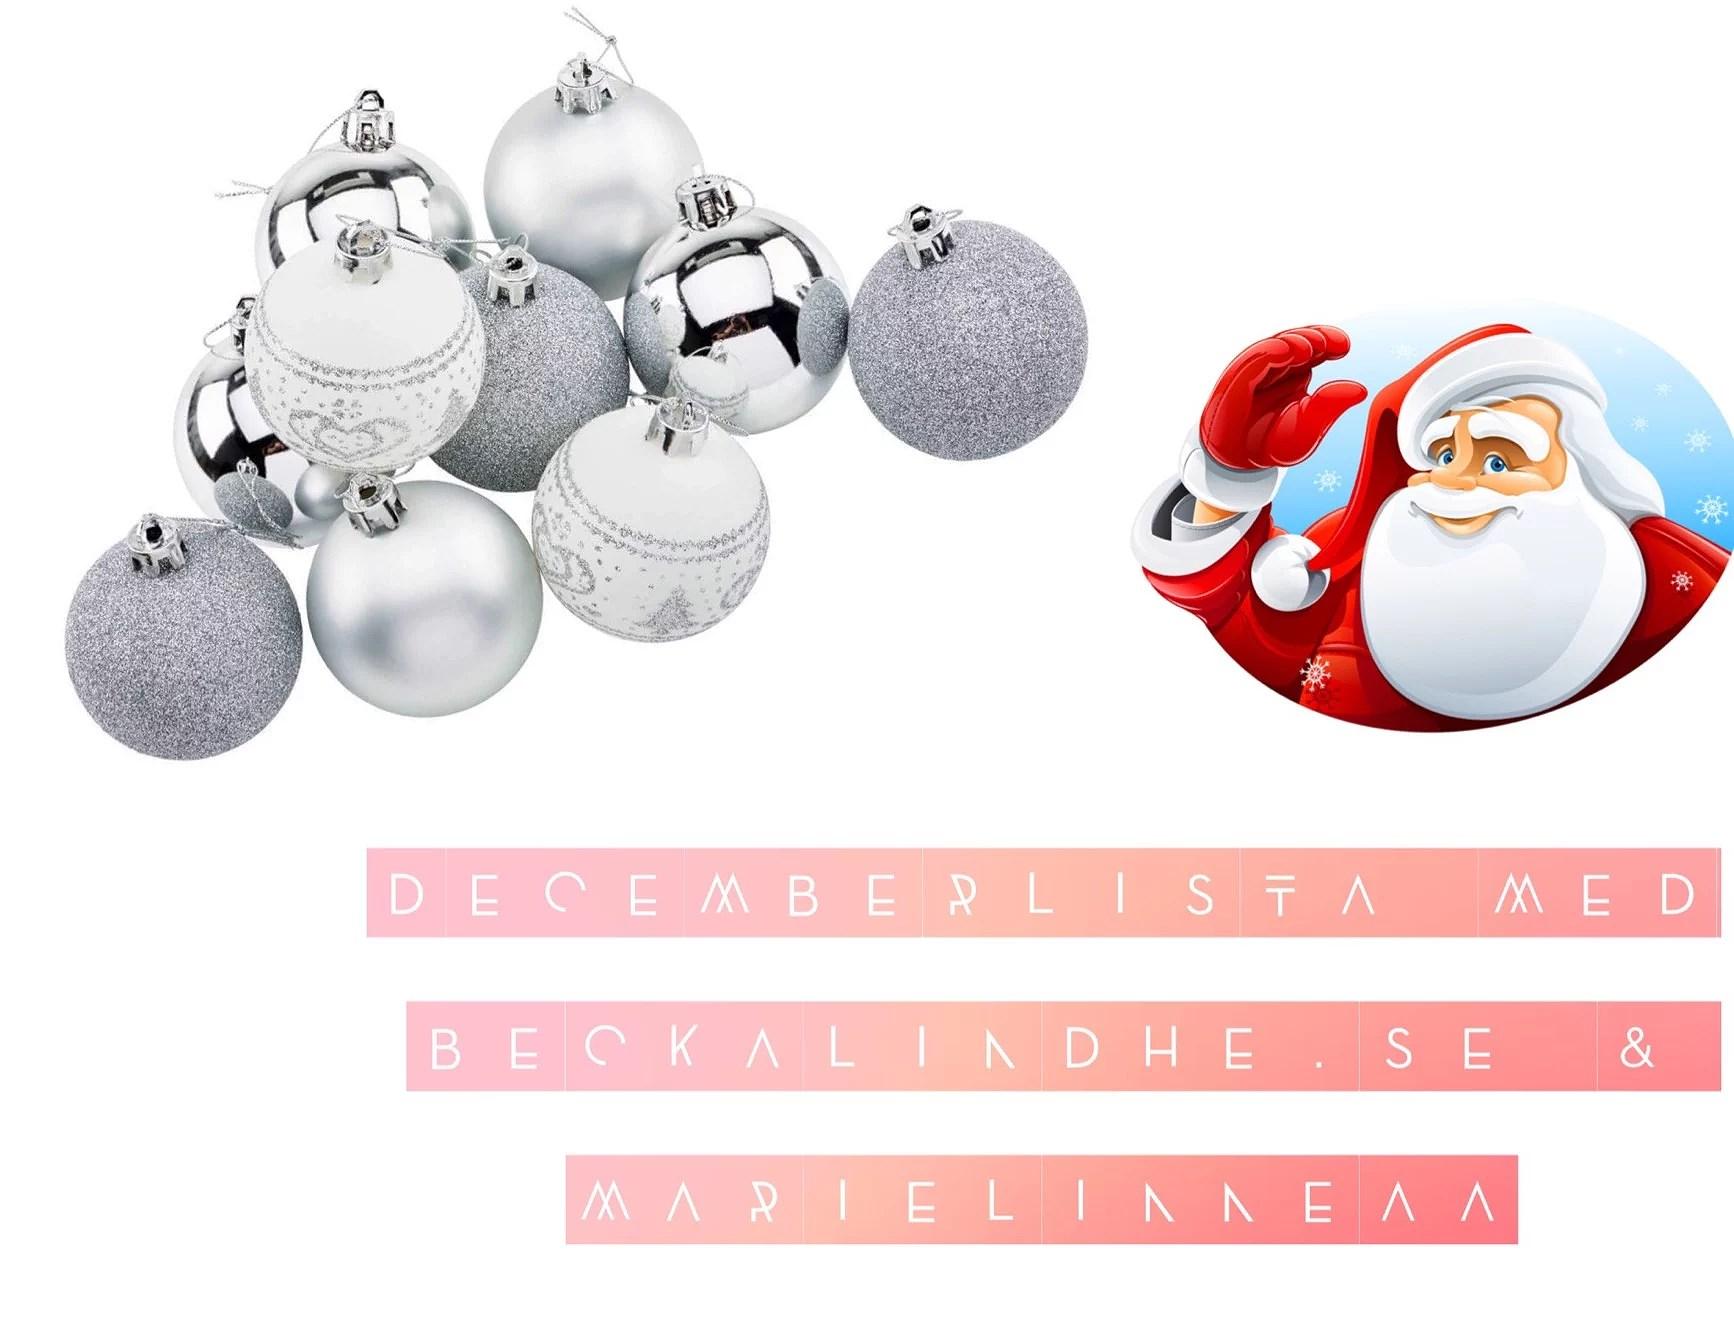 Decemberlista dag 17